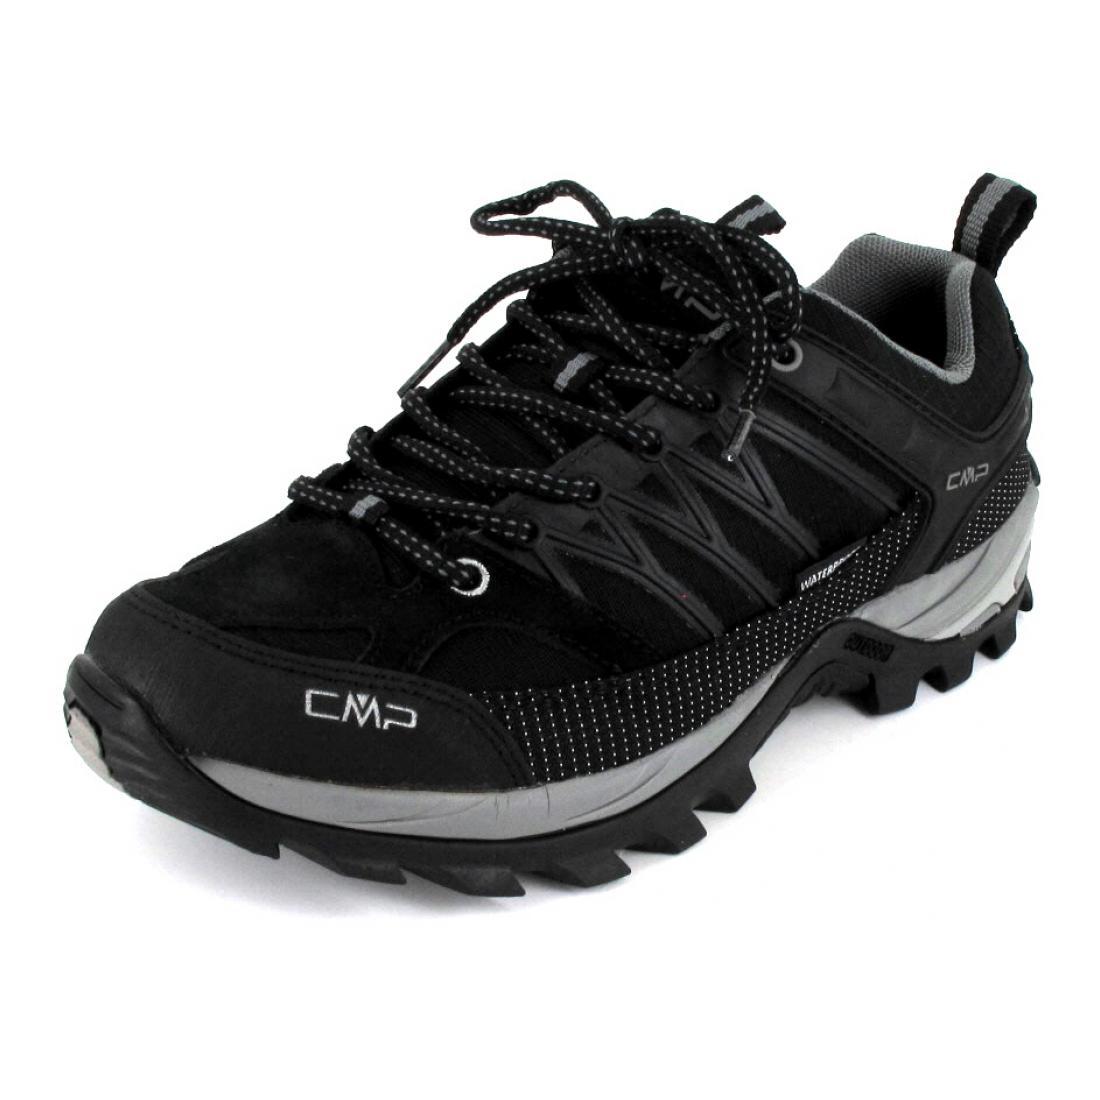 CMP Trekkingschuh Rigel Low Trekking Shoe